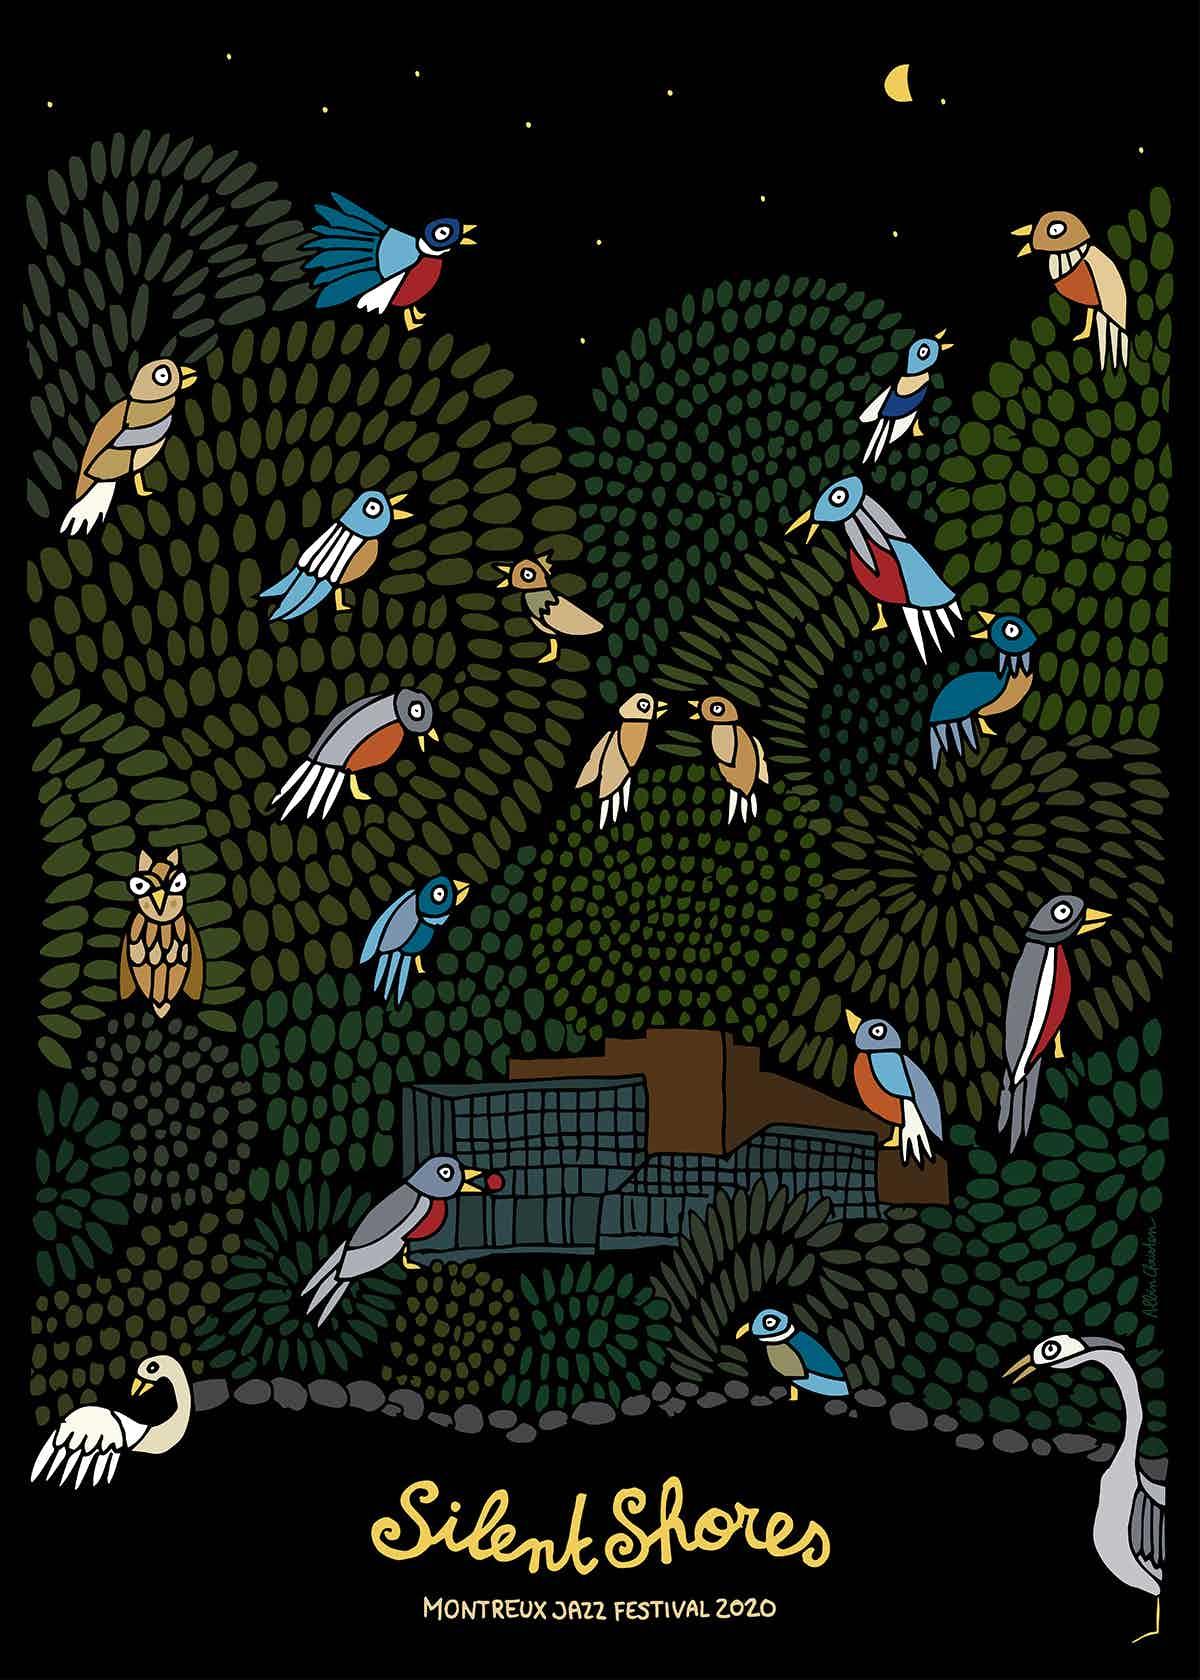 Montreux Jazz Festival poster